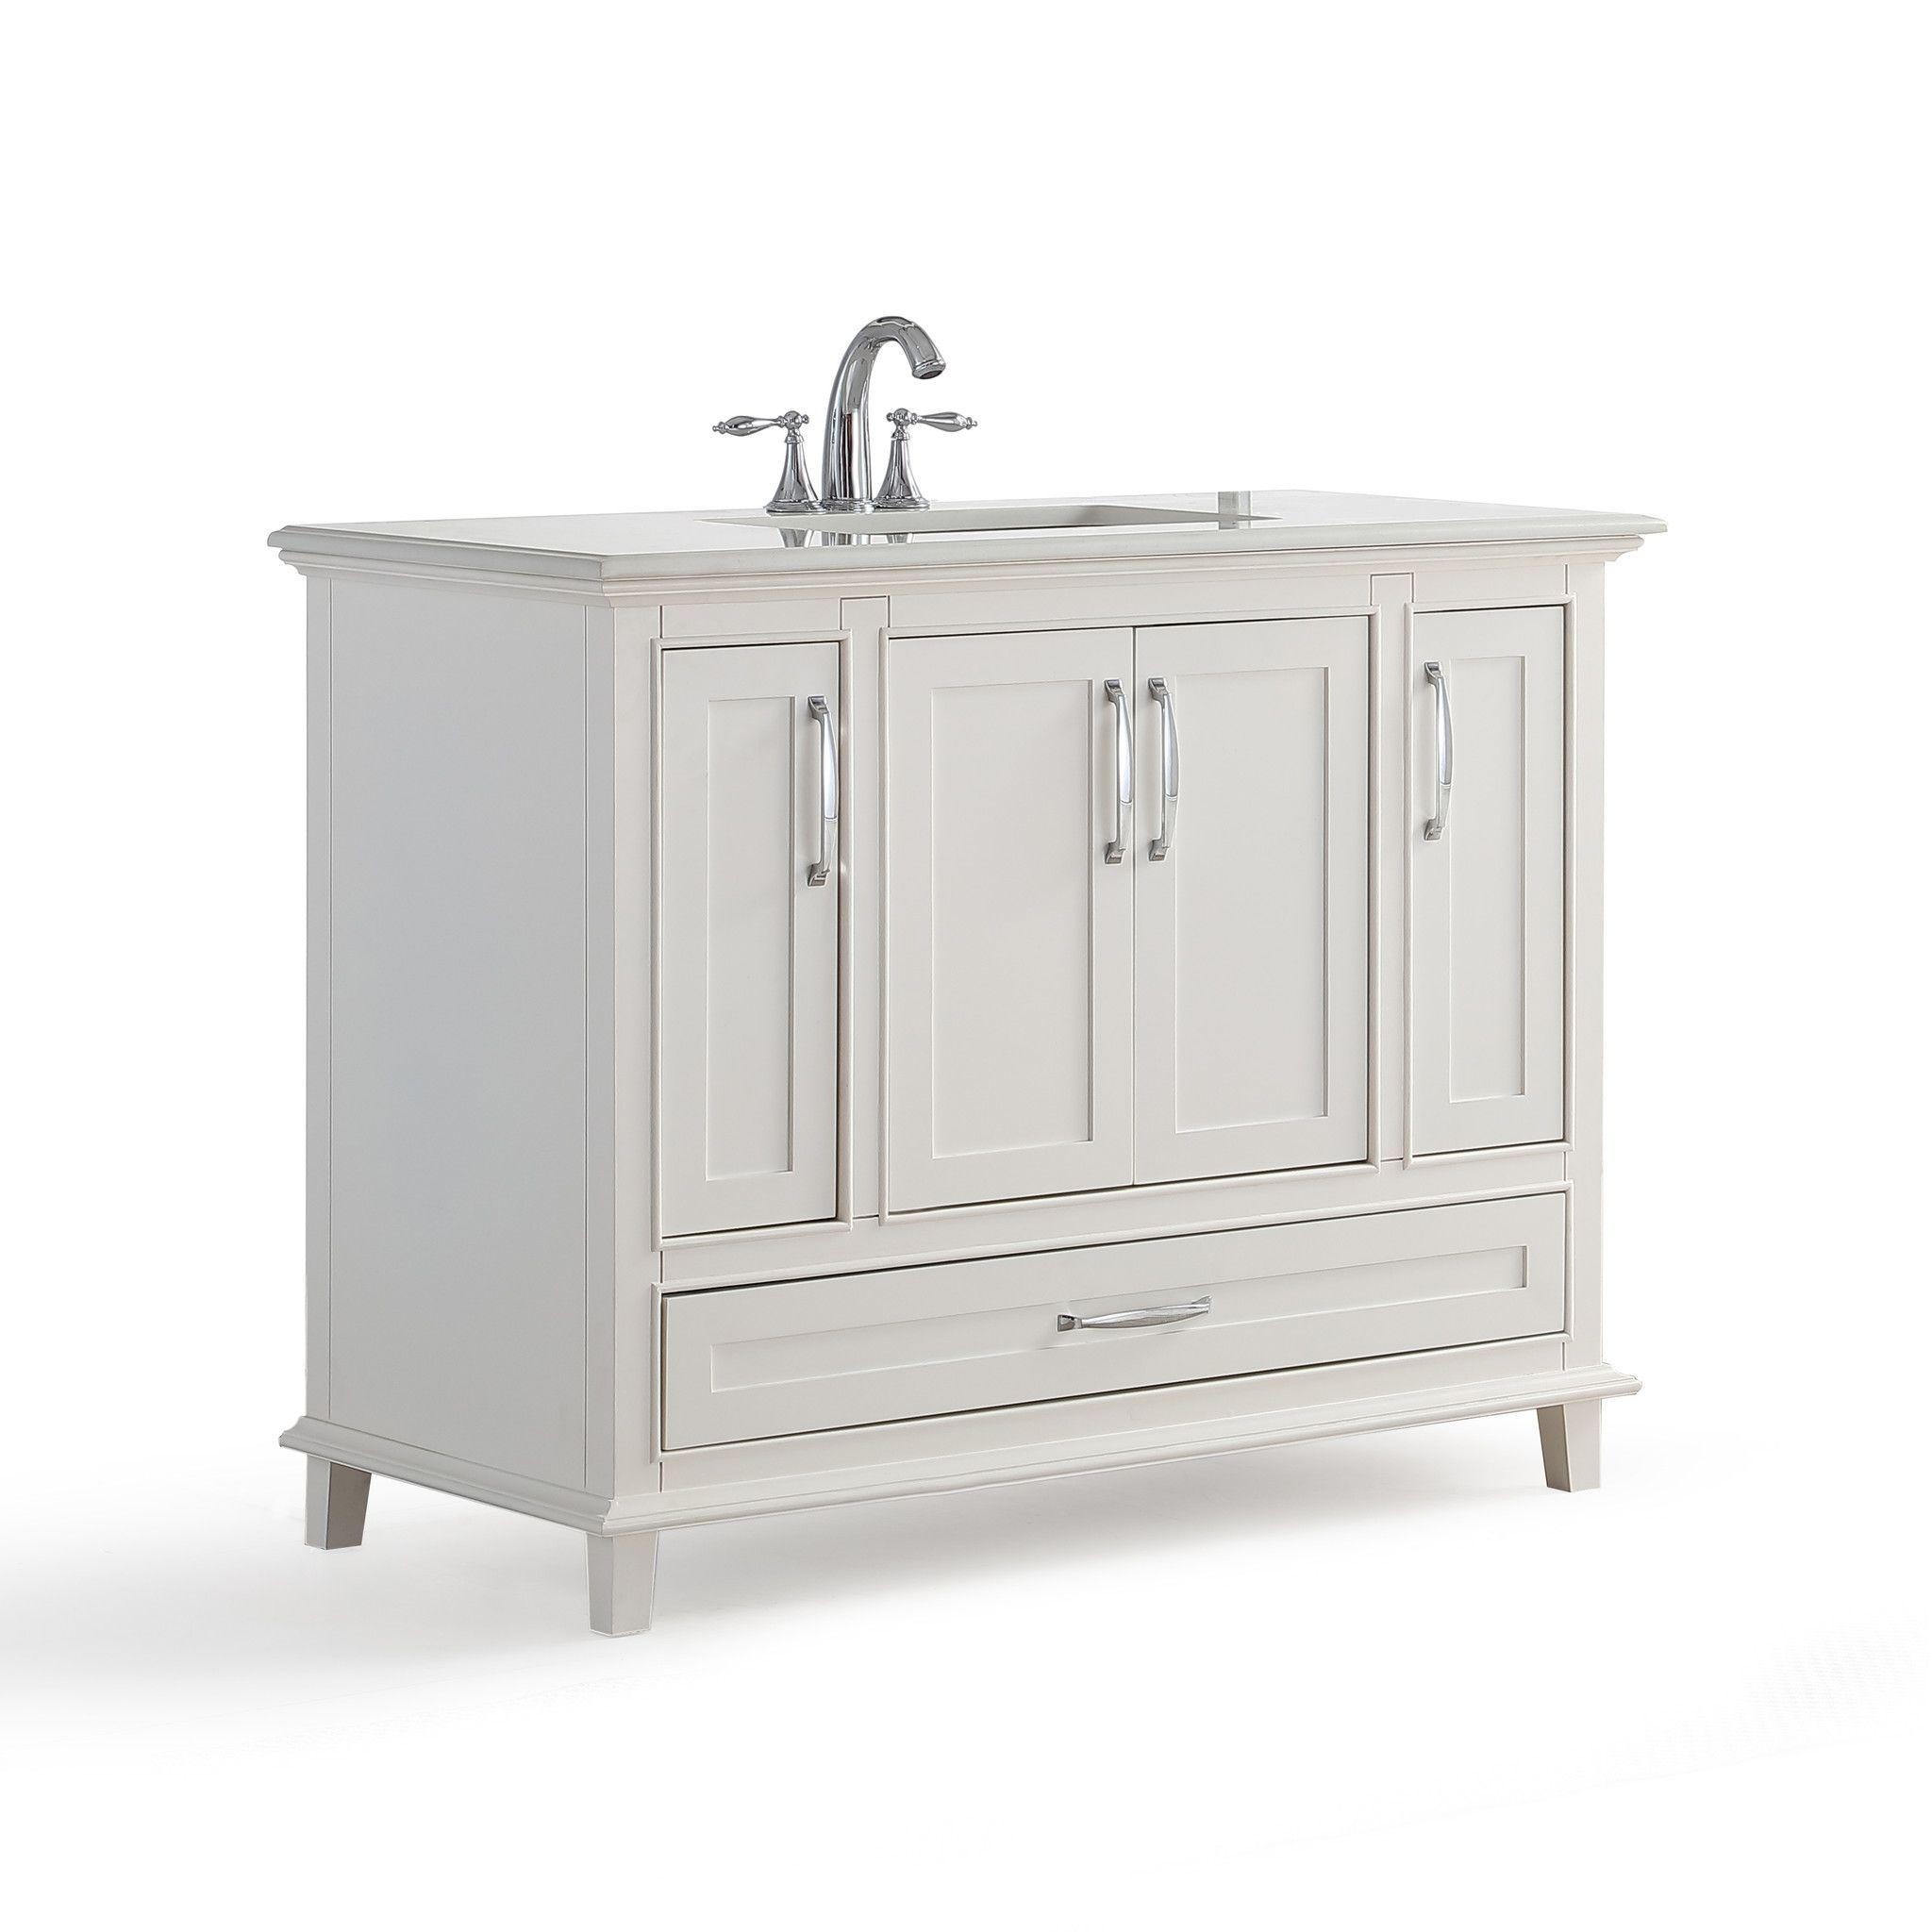 42 Inch Ariana Soft White Bath Vanity